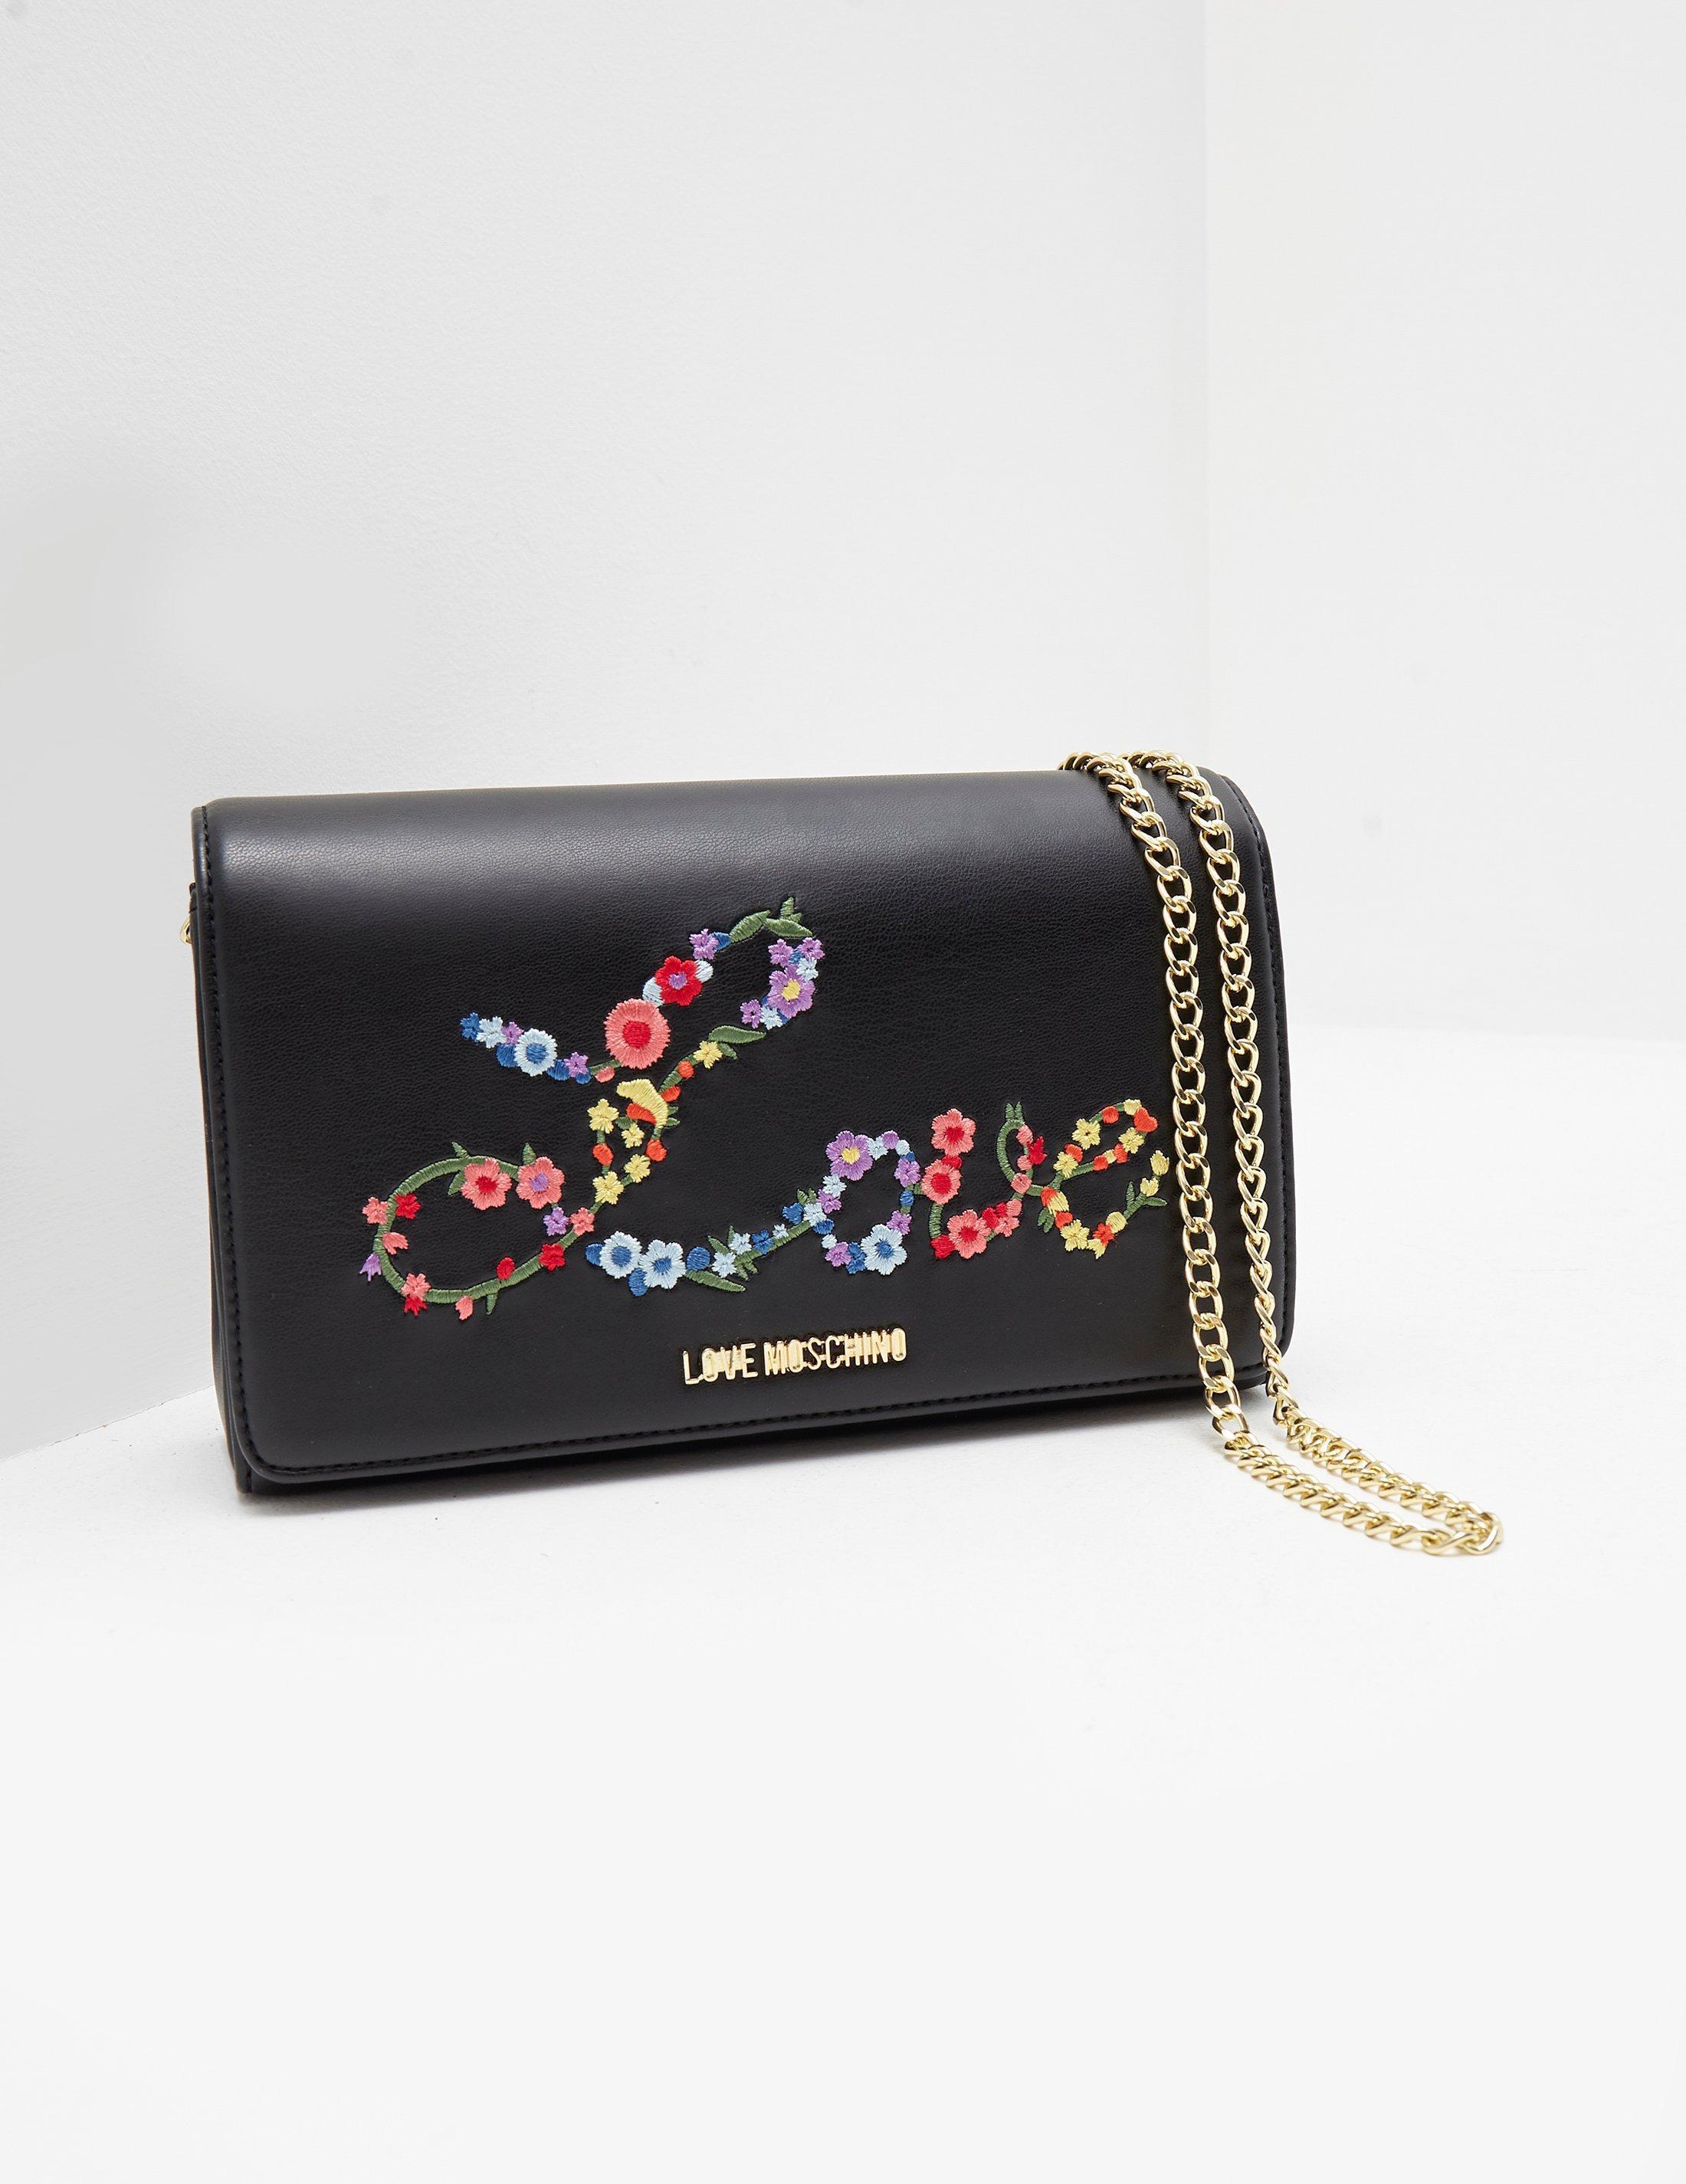 8091bbec1fe Love Moschino - Floral Love Shoulder Bag Black - Lyst. View fullscreen